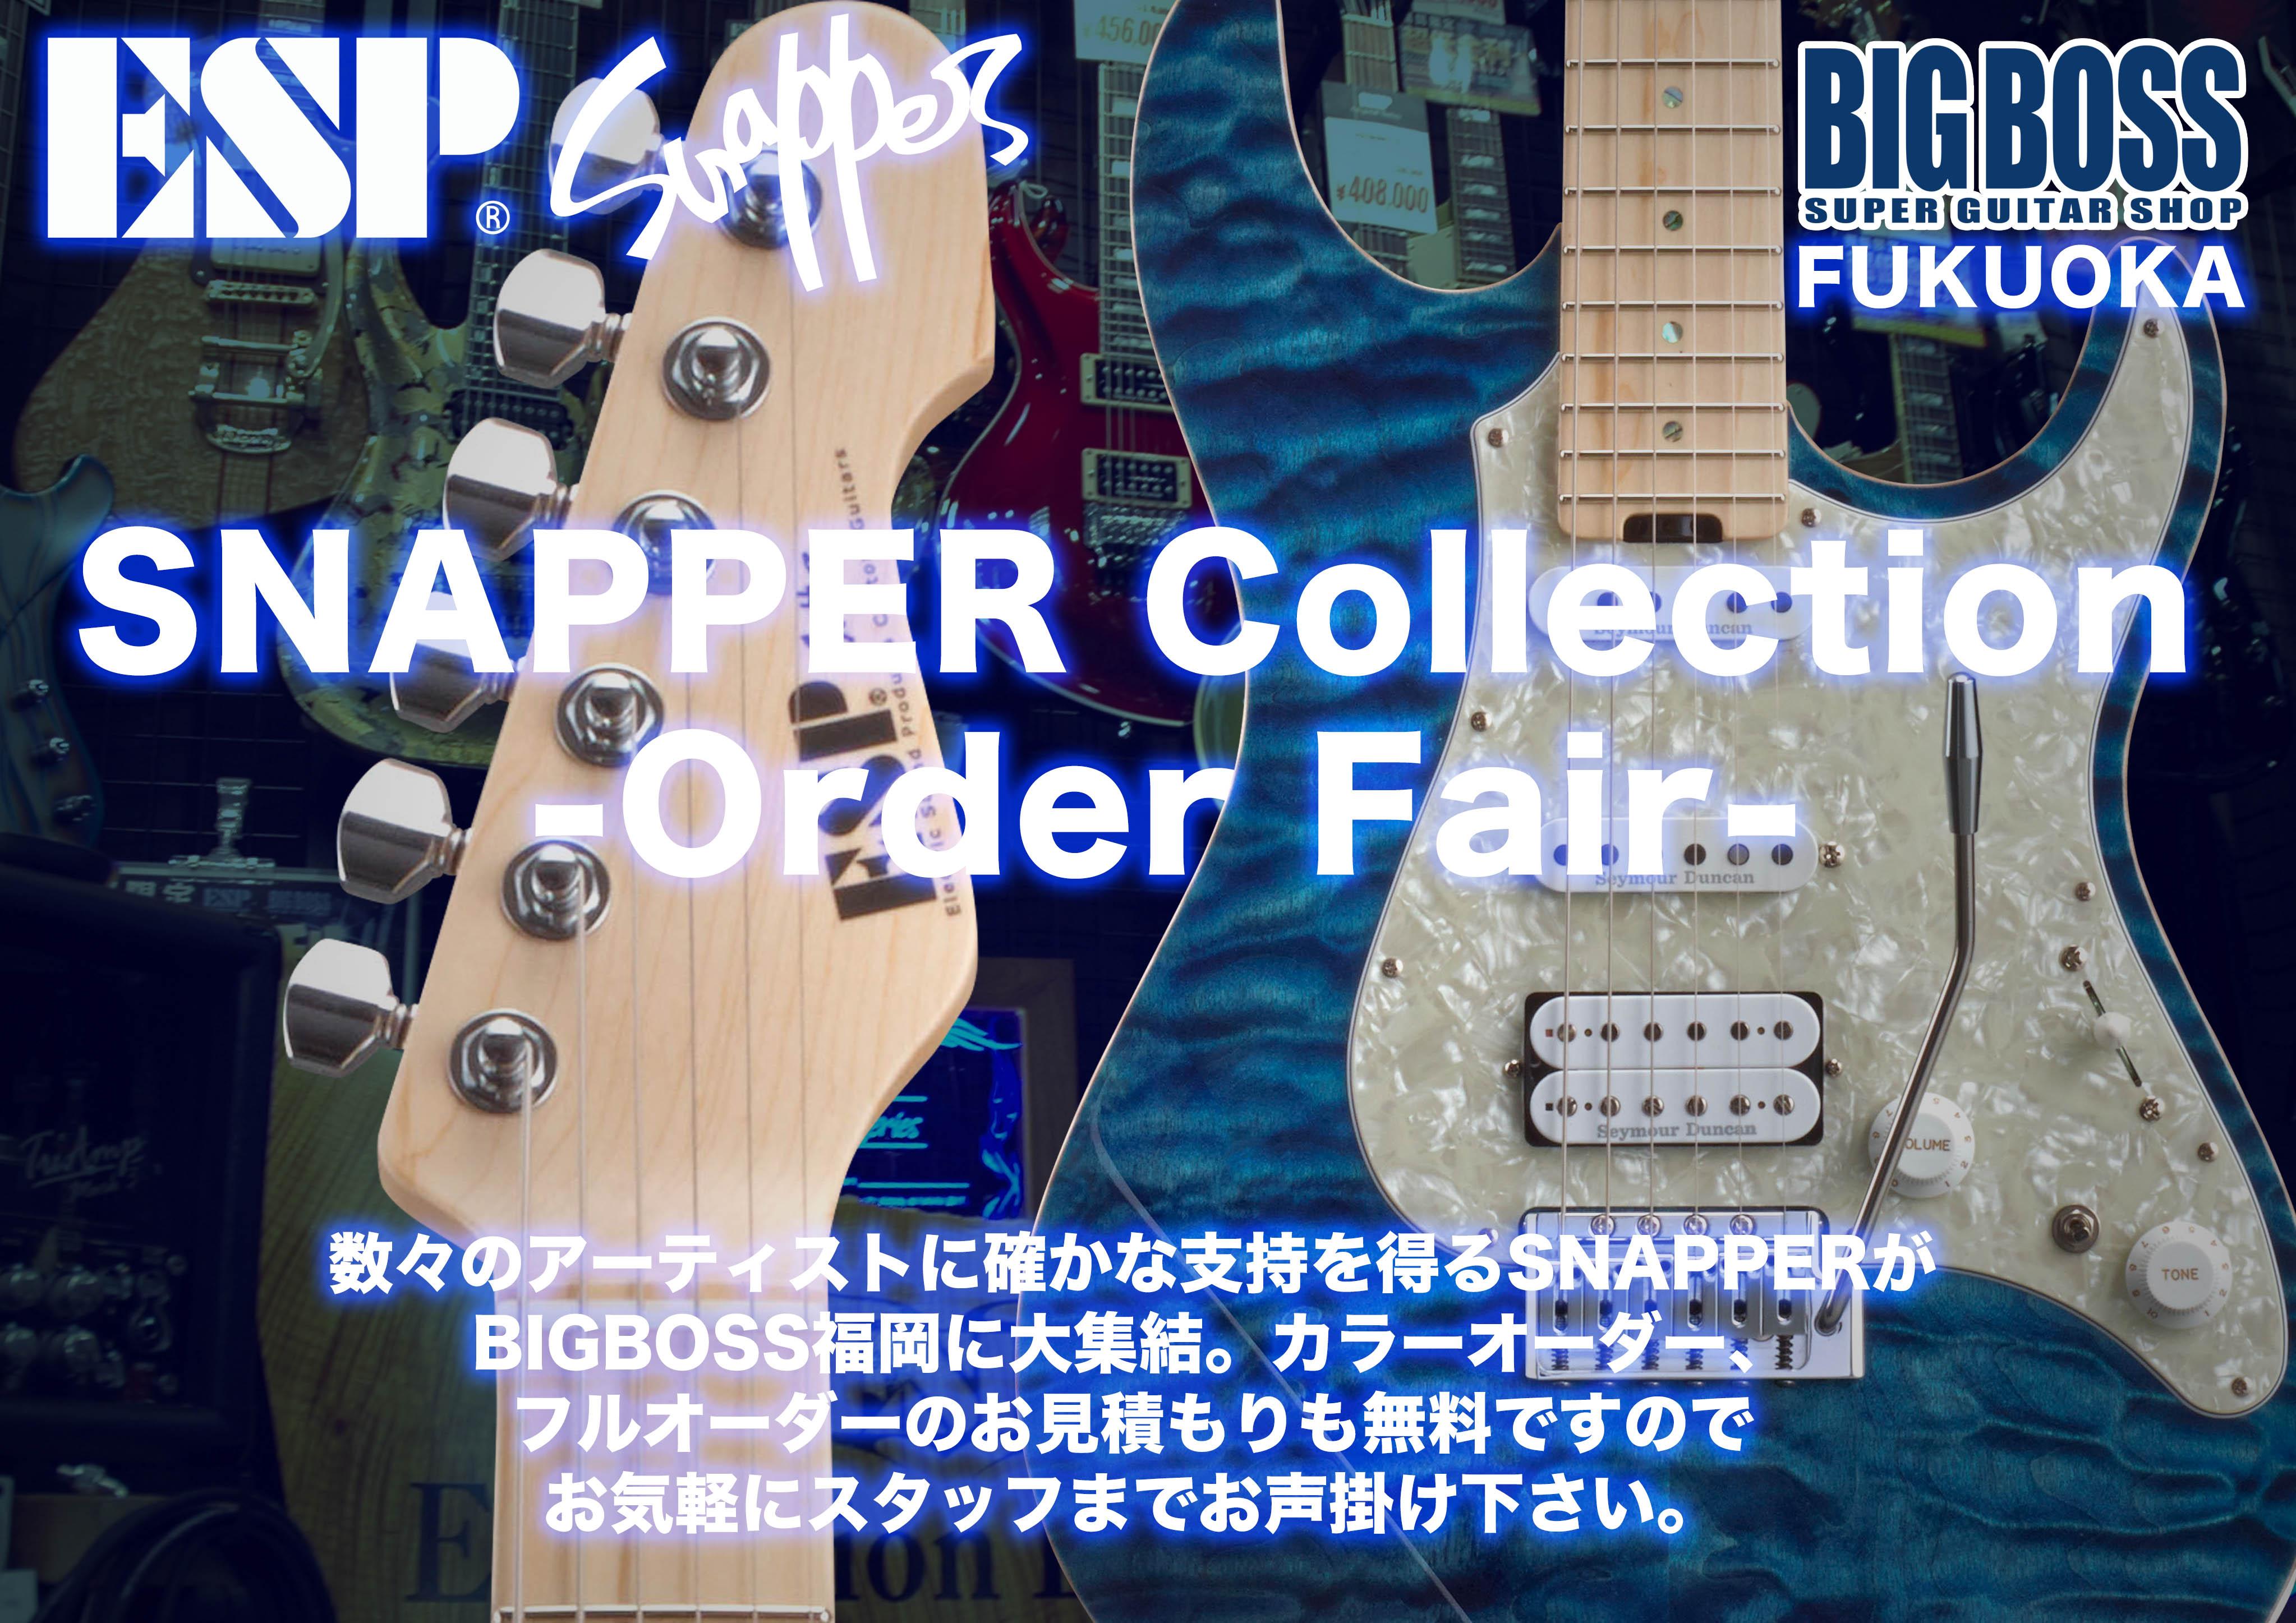 SNAPPER Collection ORDER FAIR